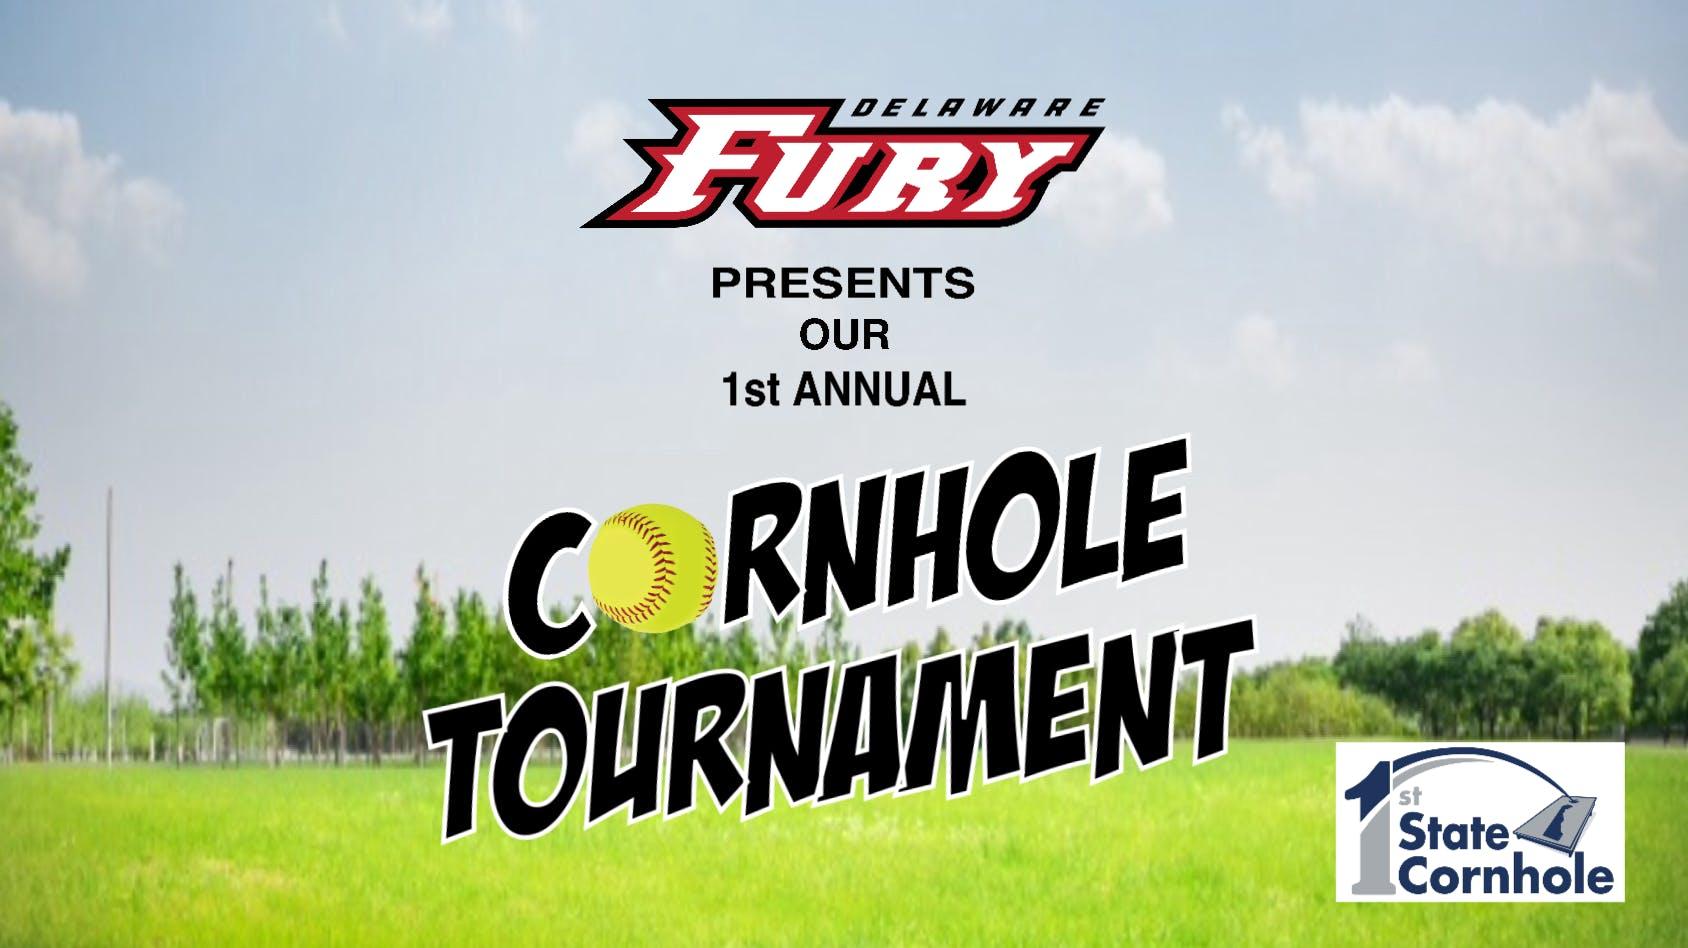 Delaware Furys Annual Cornhole Tourney